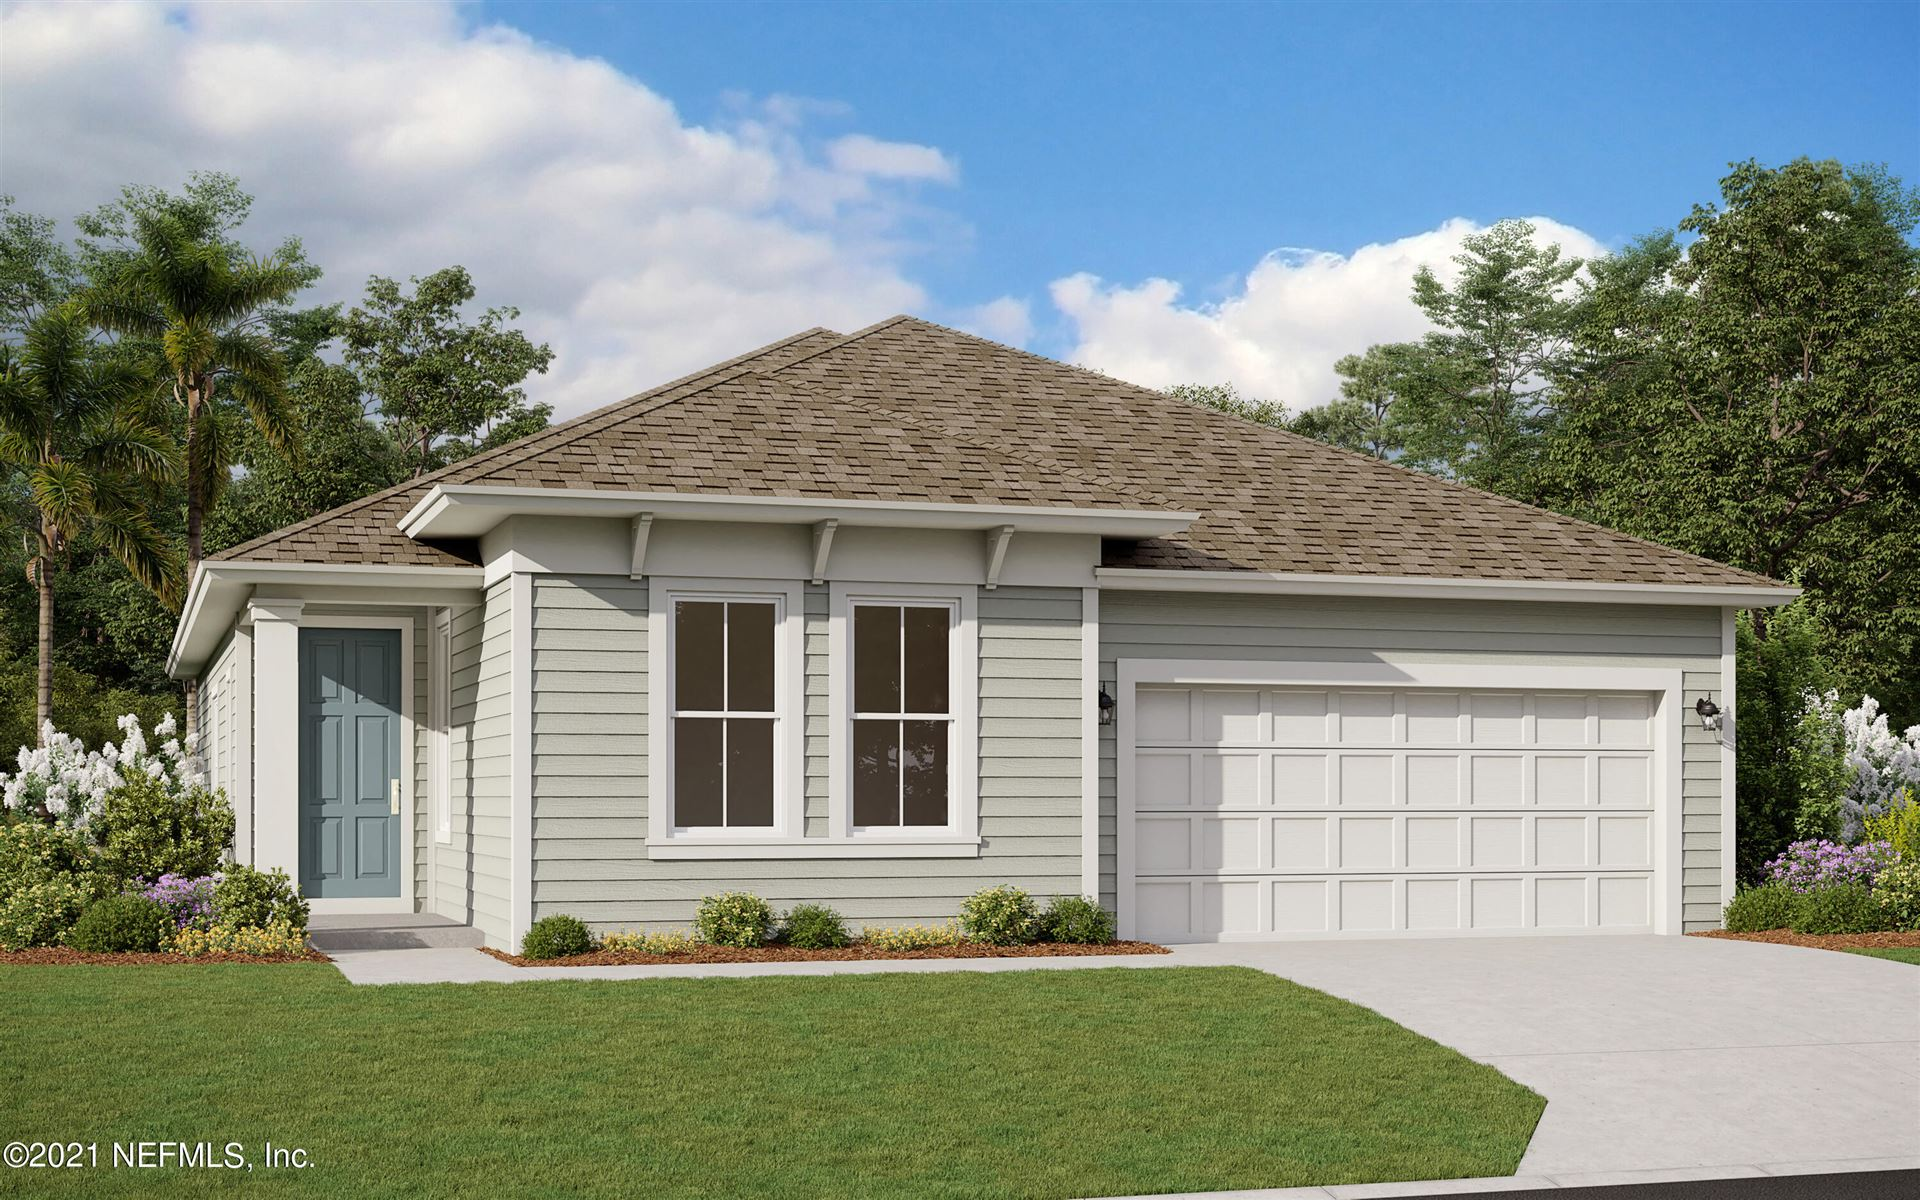 2860 COPPERWOOD AVE #Lot No: 049, Orange Park, FL 32073 - MLS#: 1094186